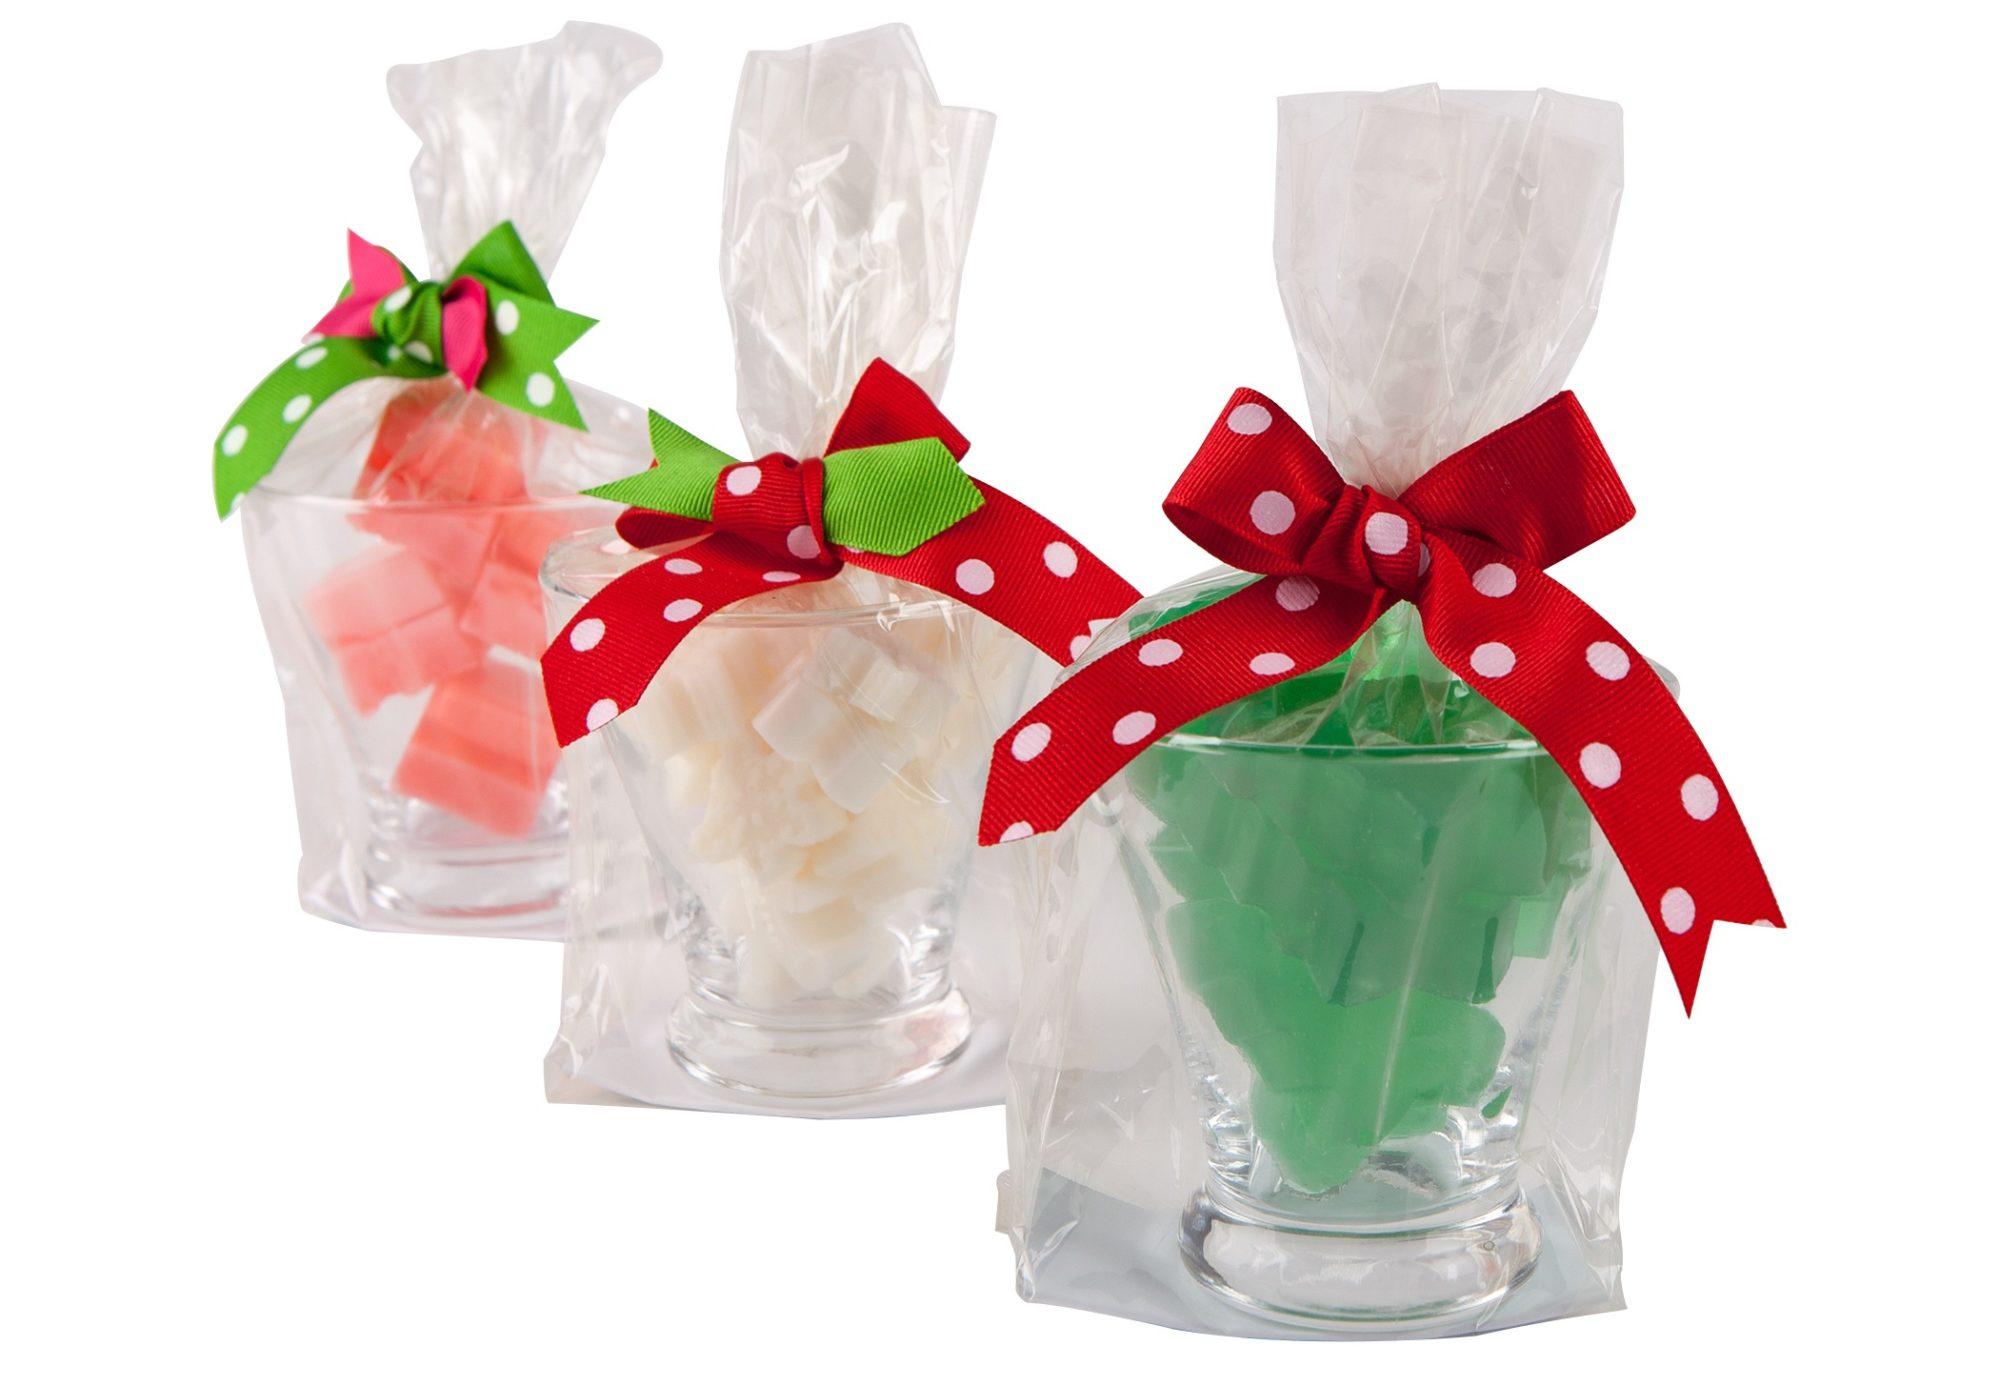 Shop Local Leelanau Holiday Shopping Gift Guide 2017 Mynorth Com